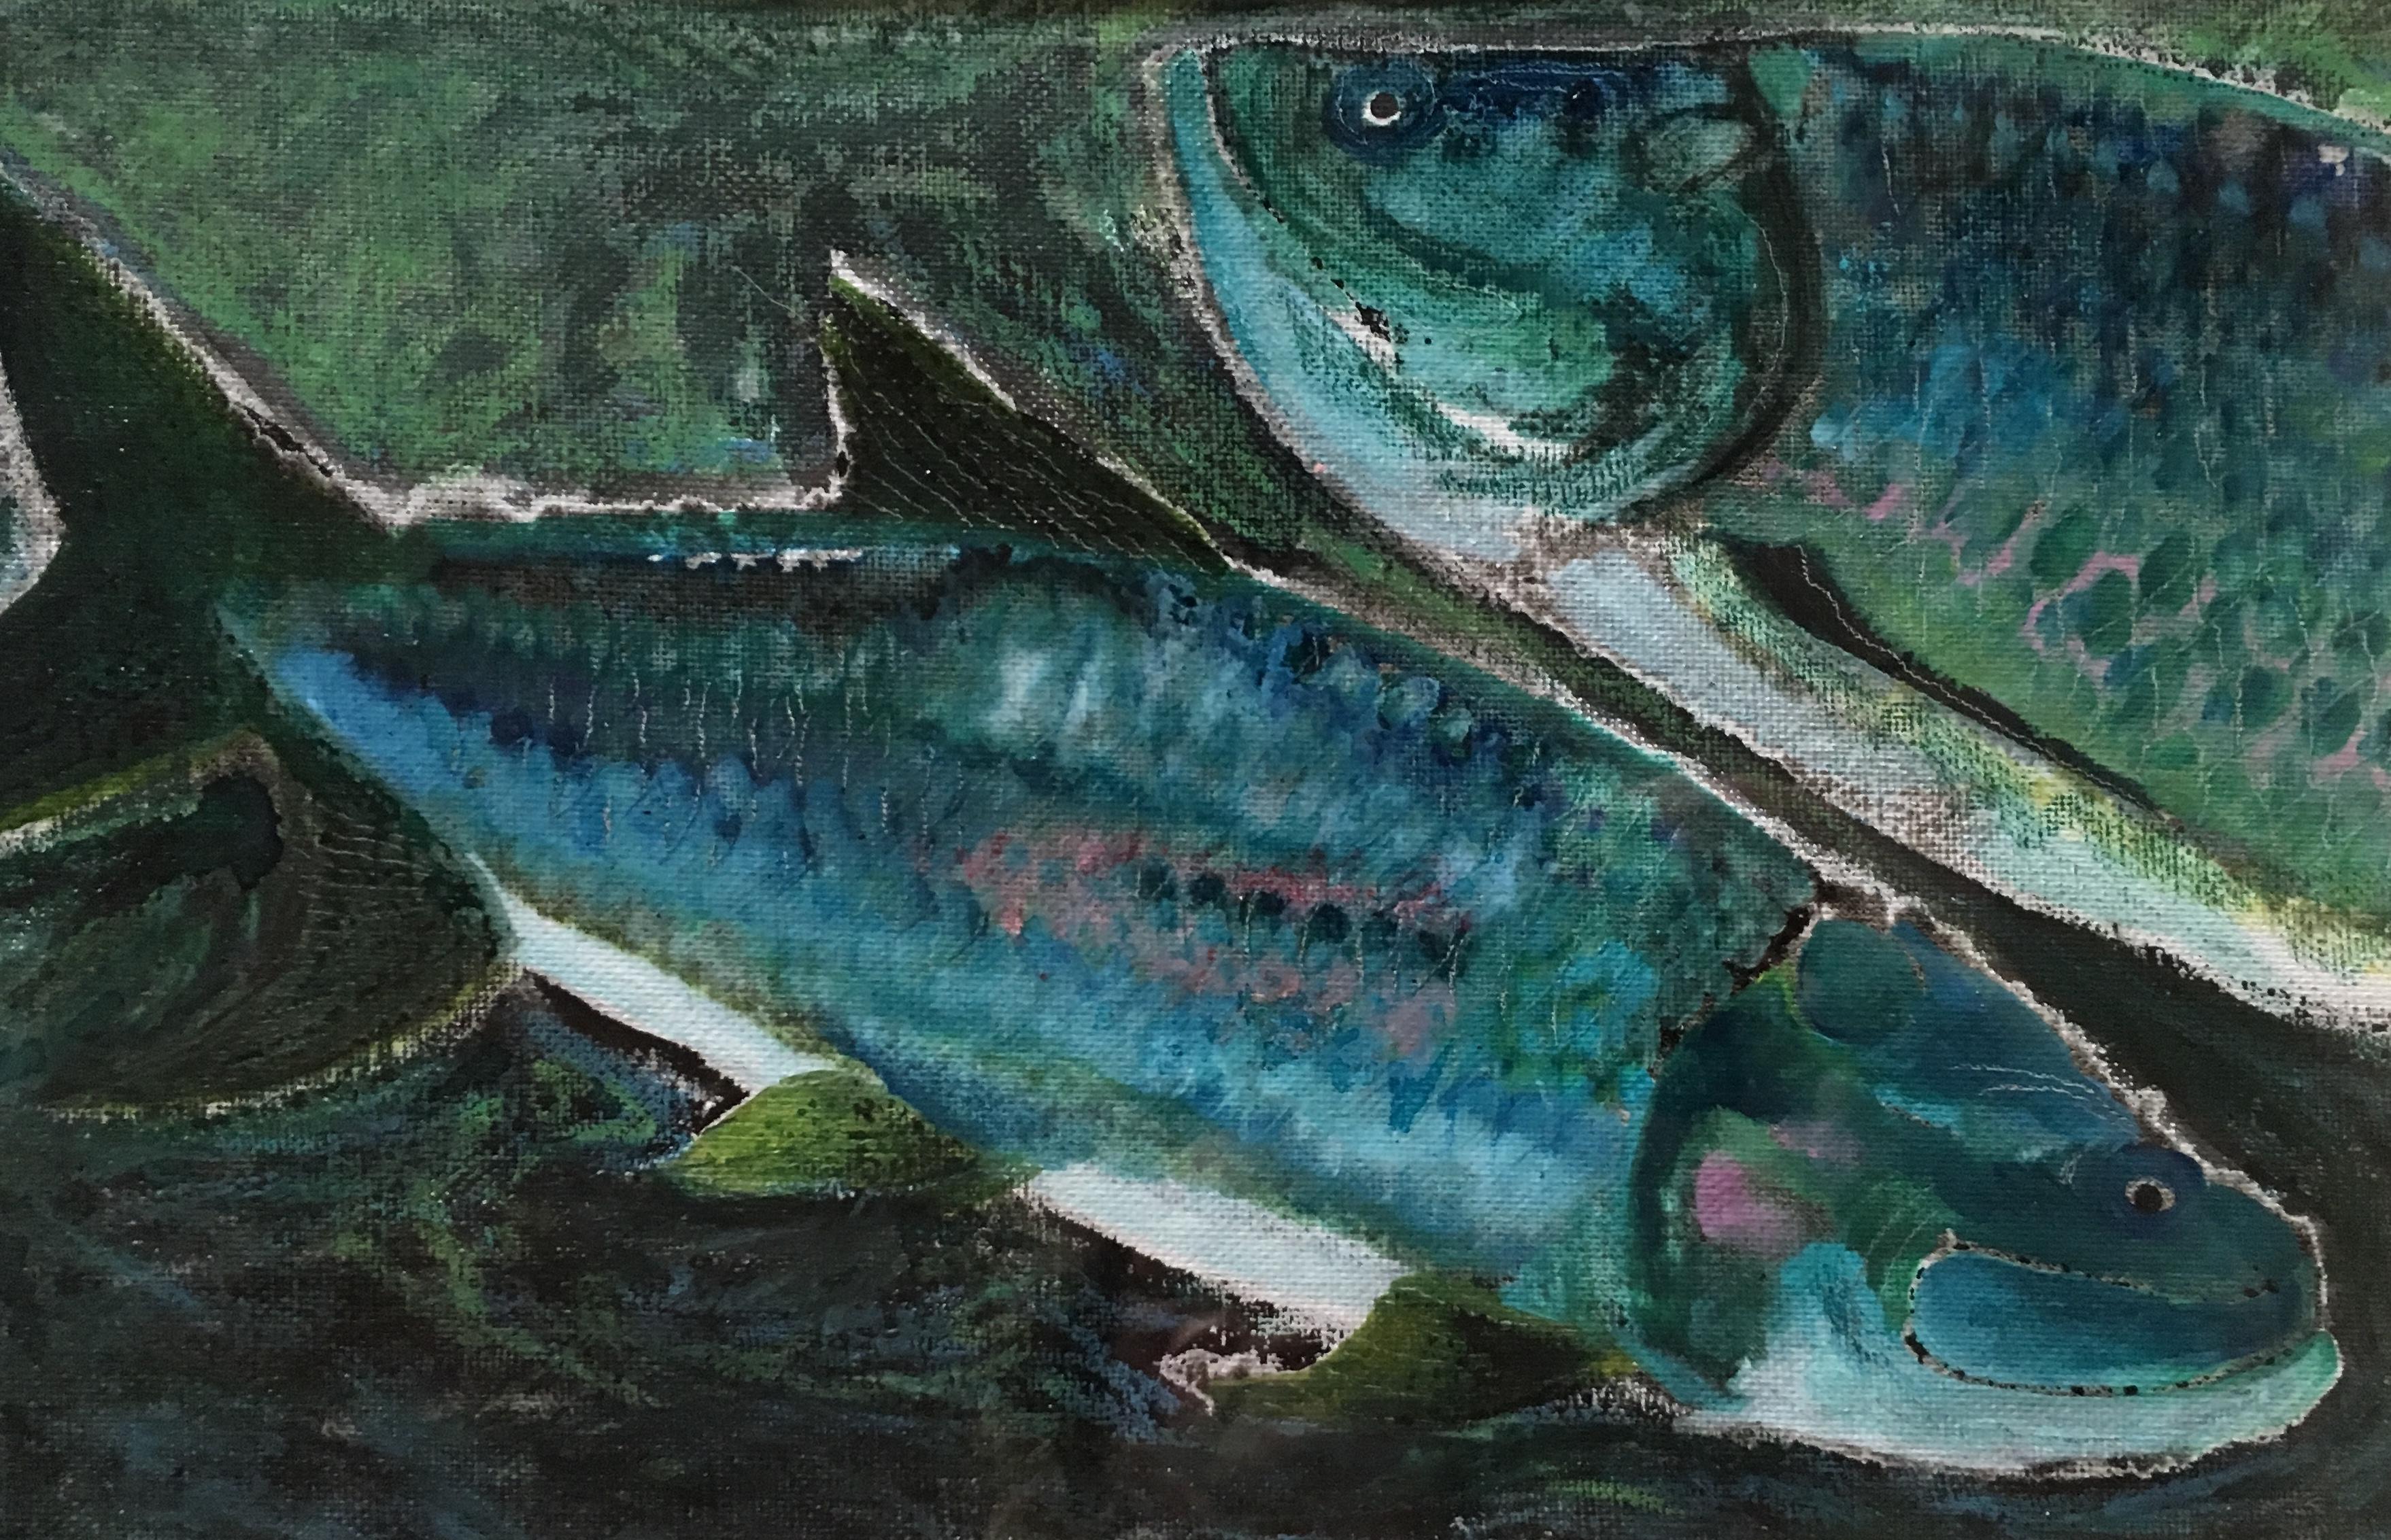 Blue Fish - redux